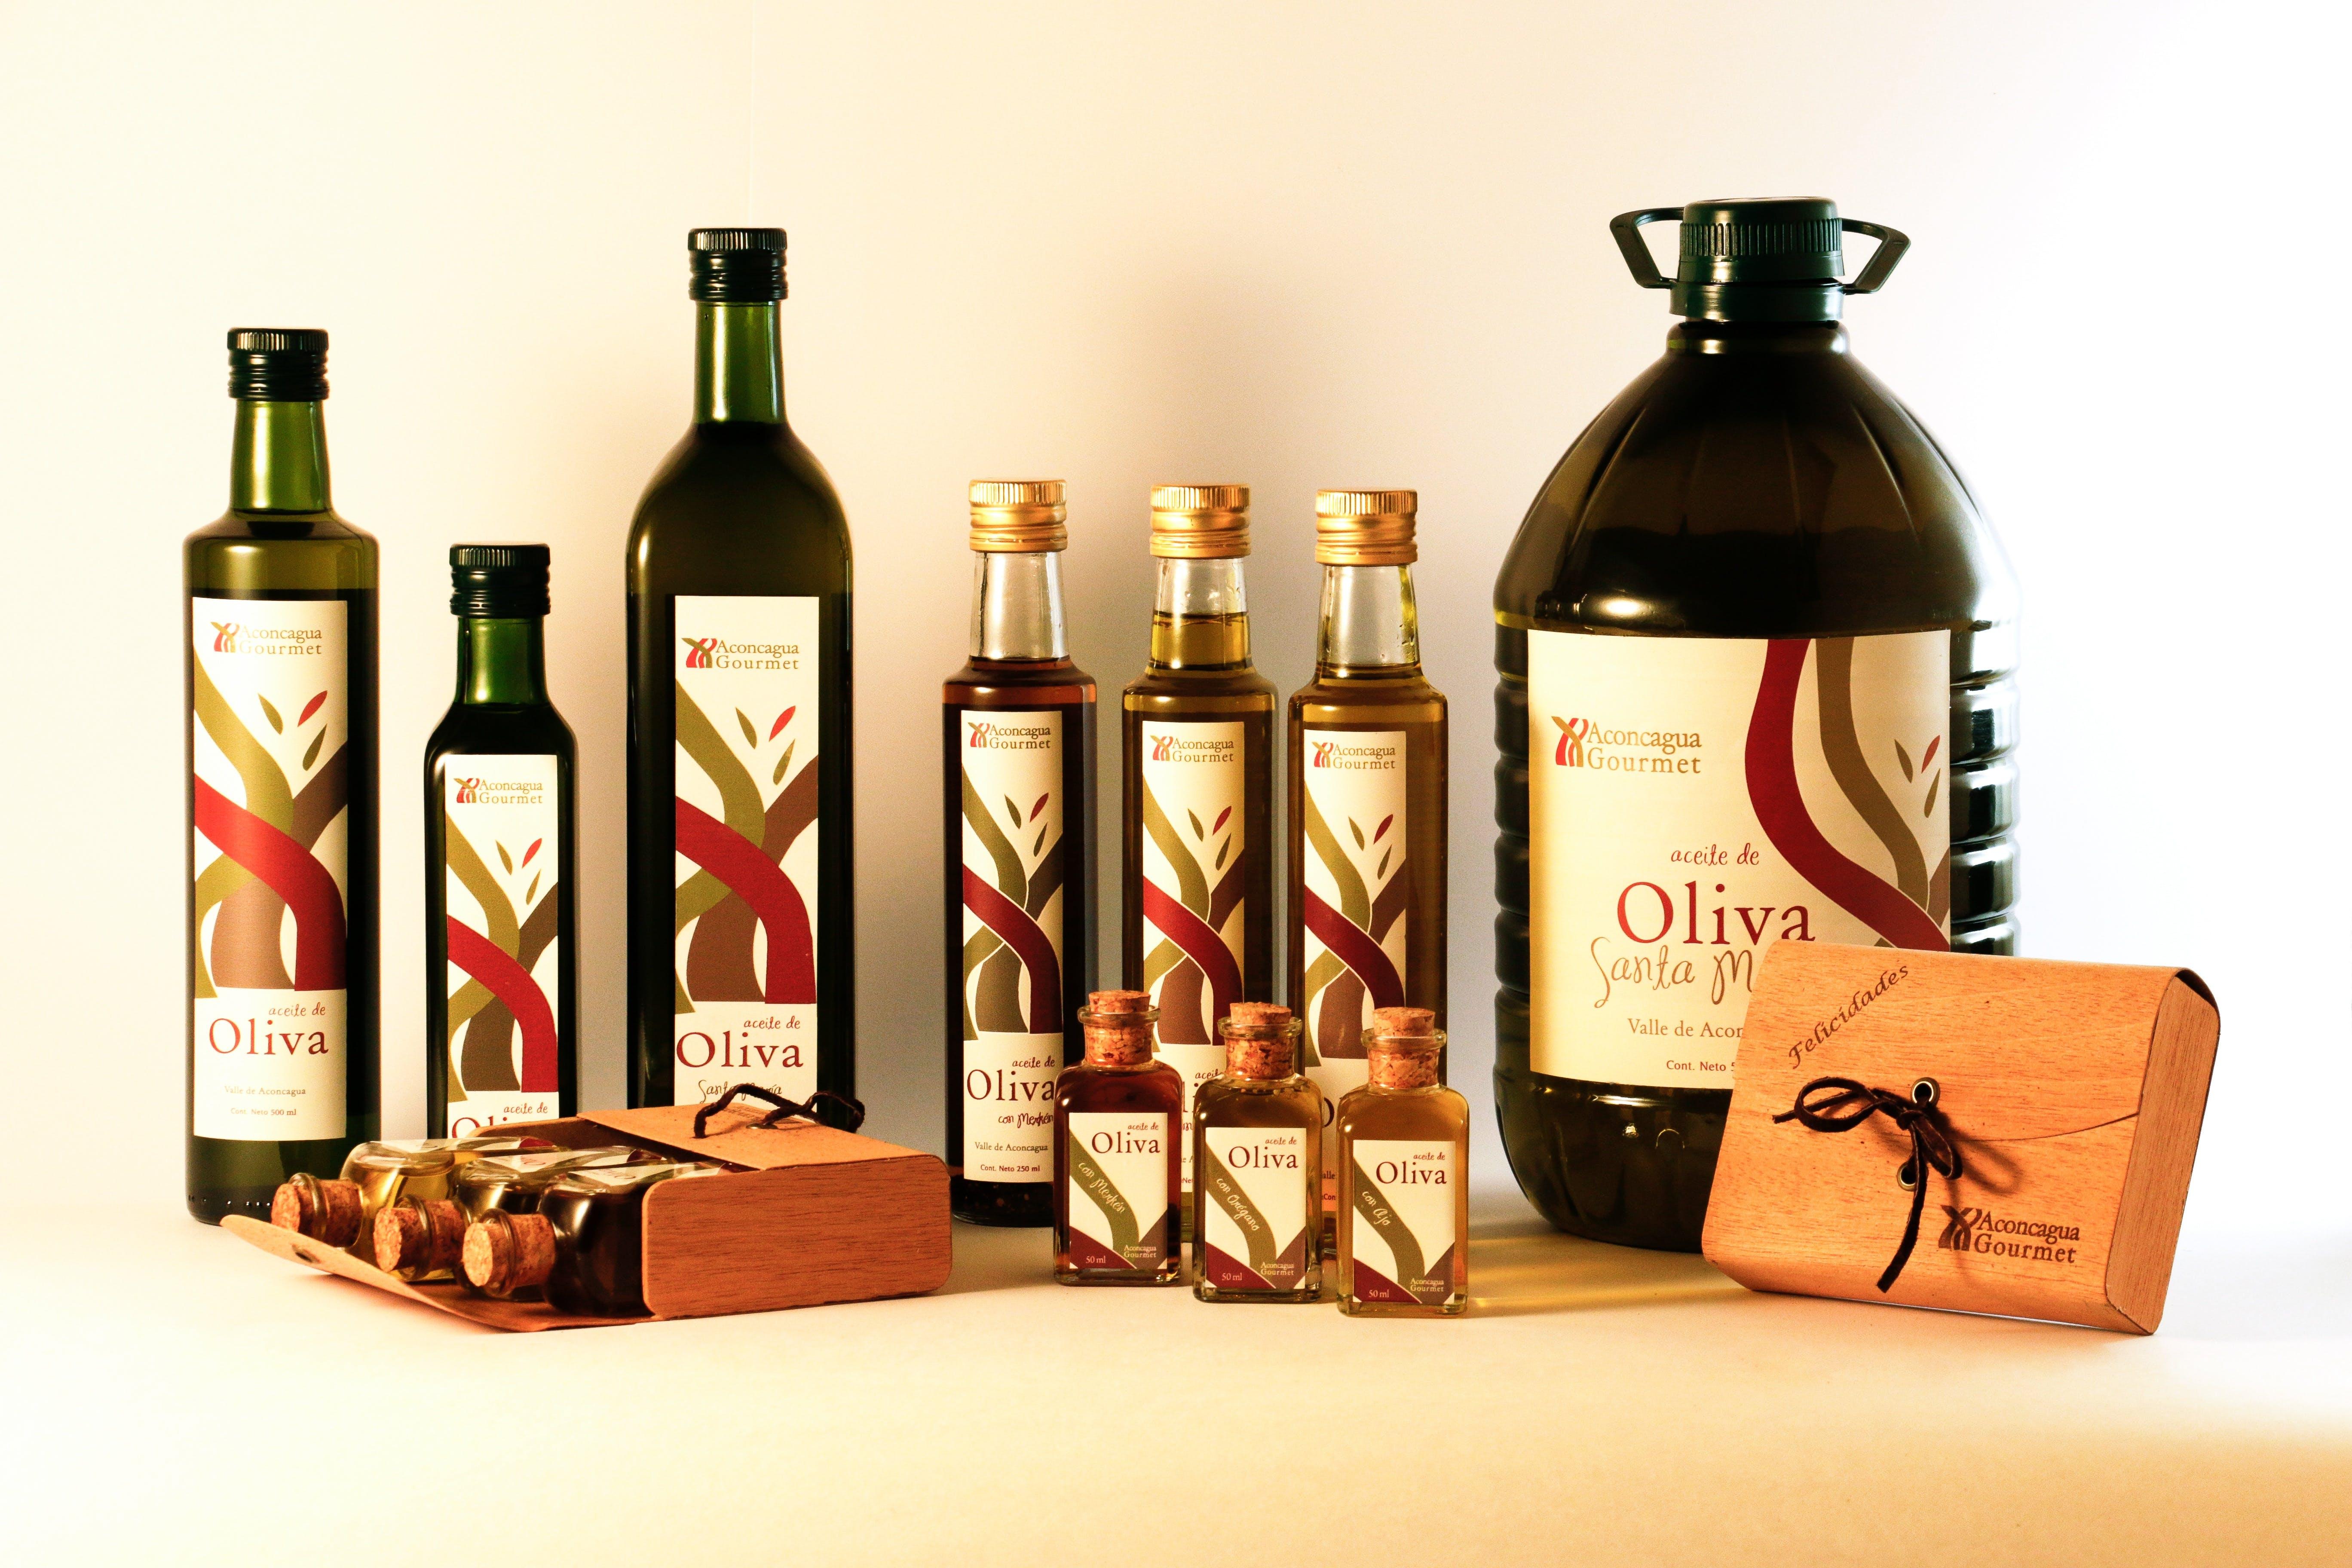 Assorted Bottles on White Table